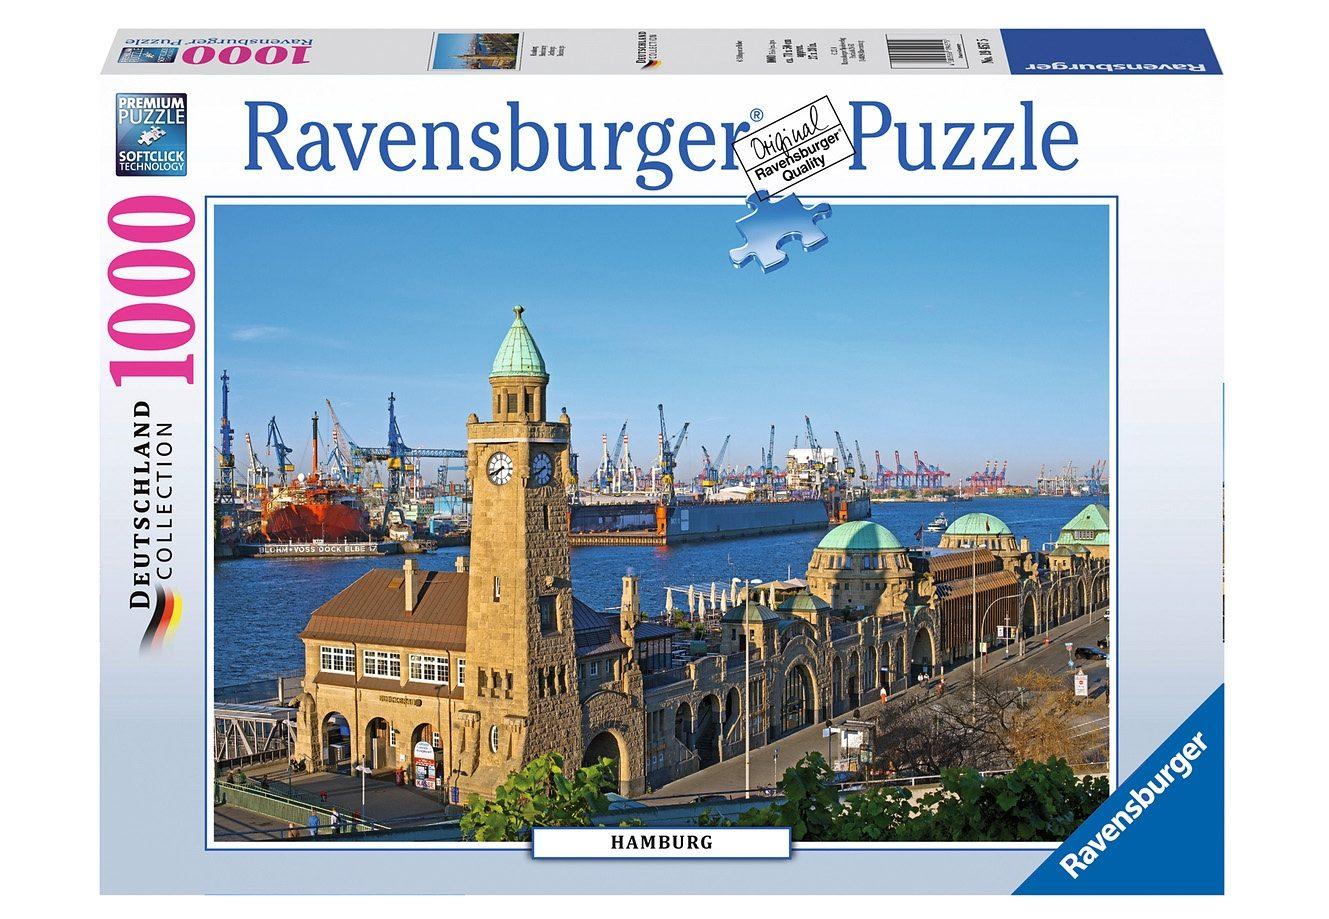 Ravensburger Puzzle 1000 Teile, »Hamburg«